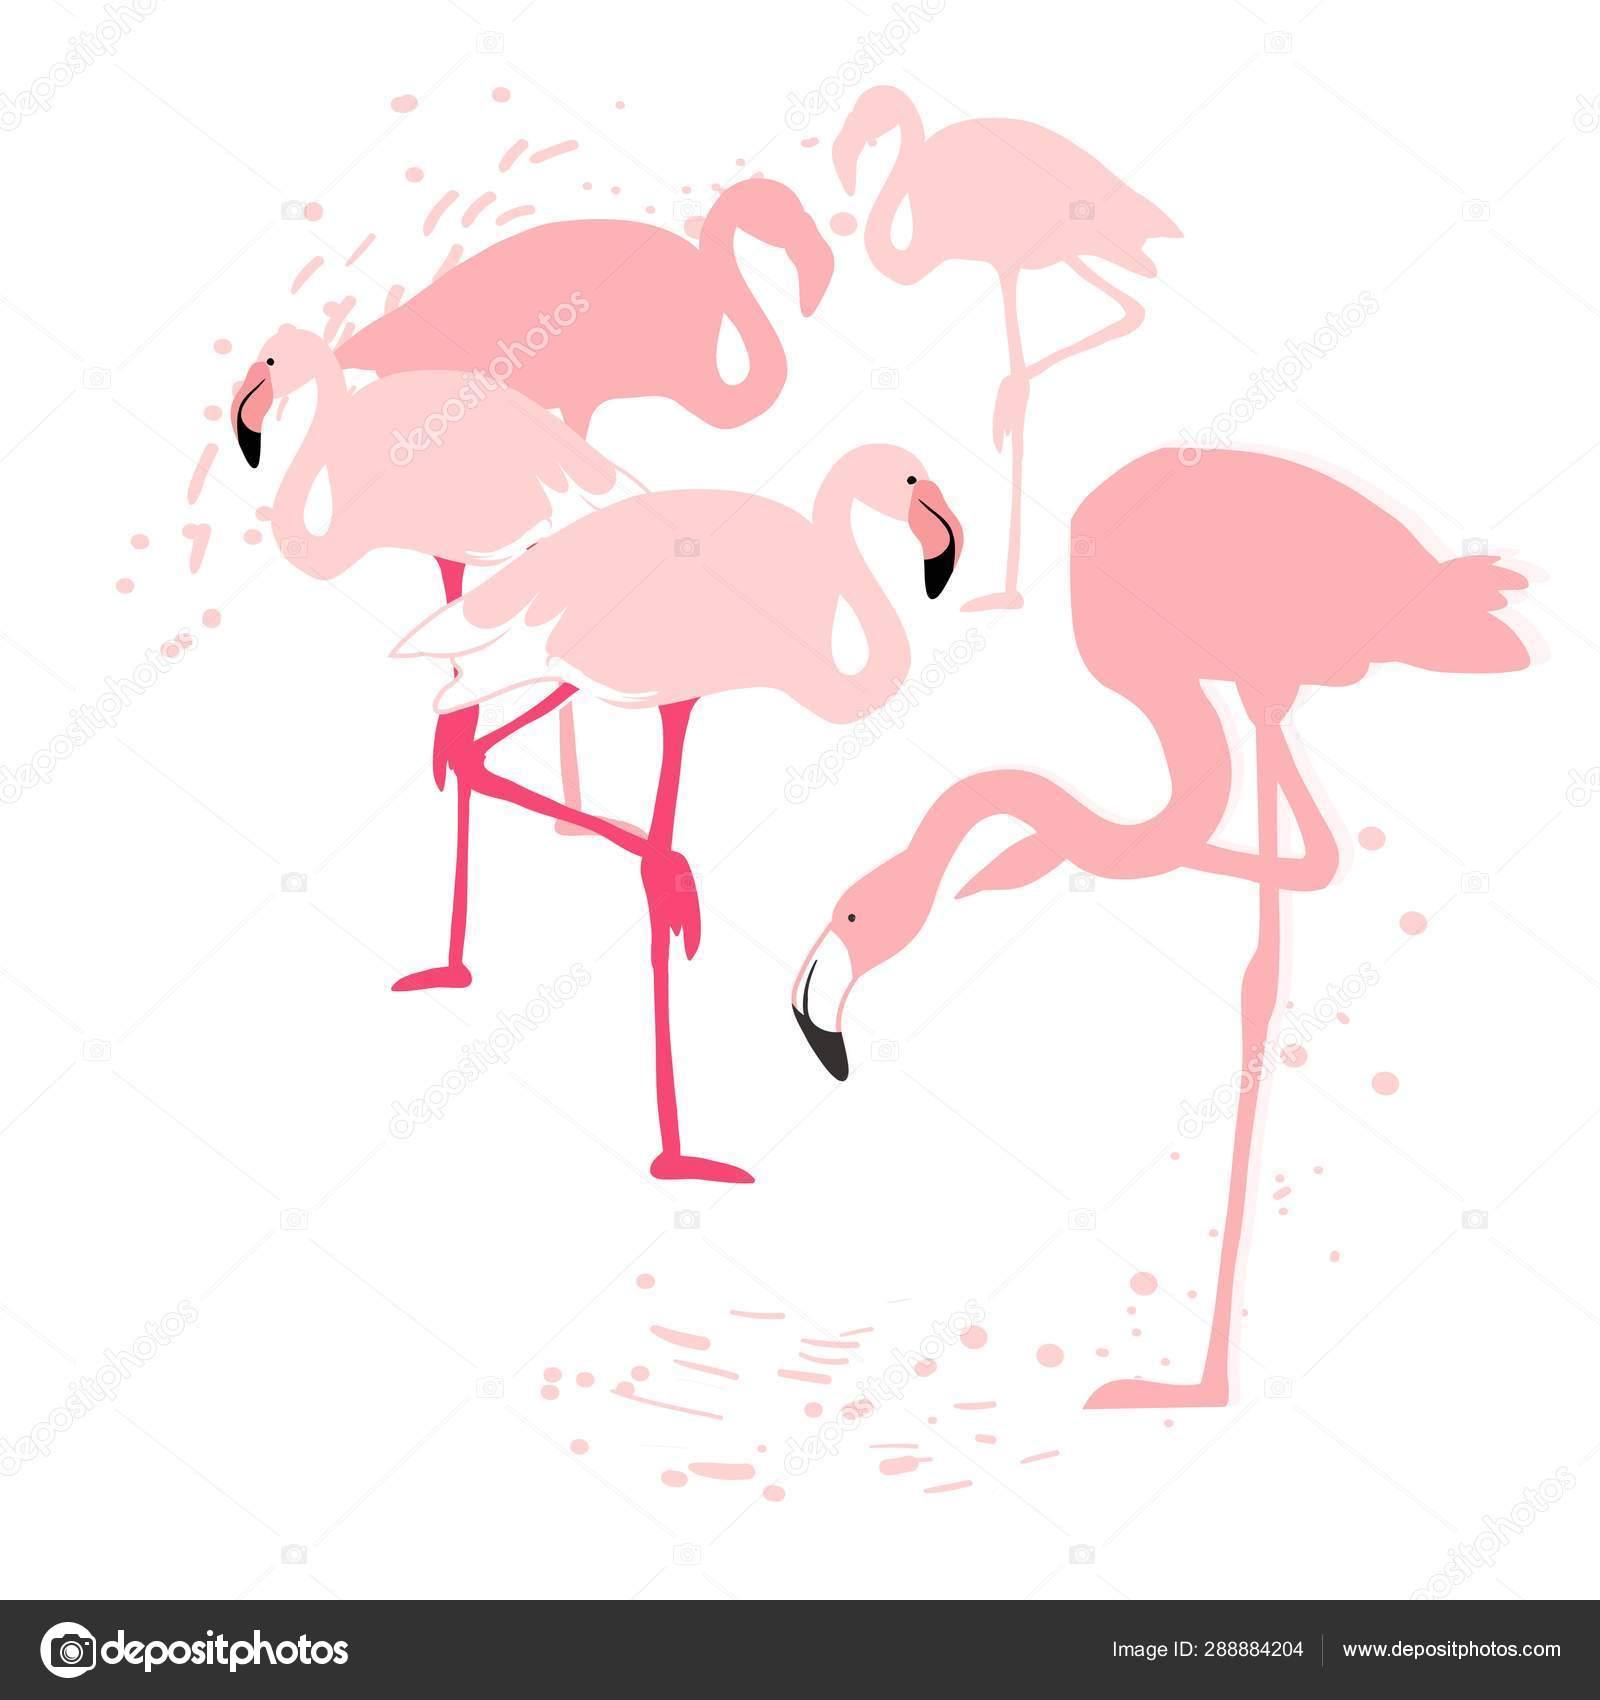 pink flamingo silhouette flock